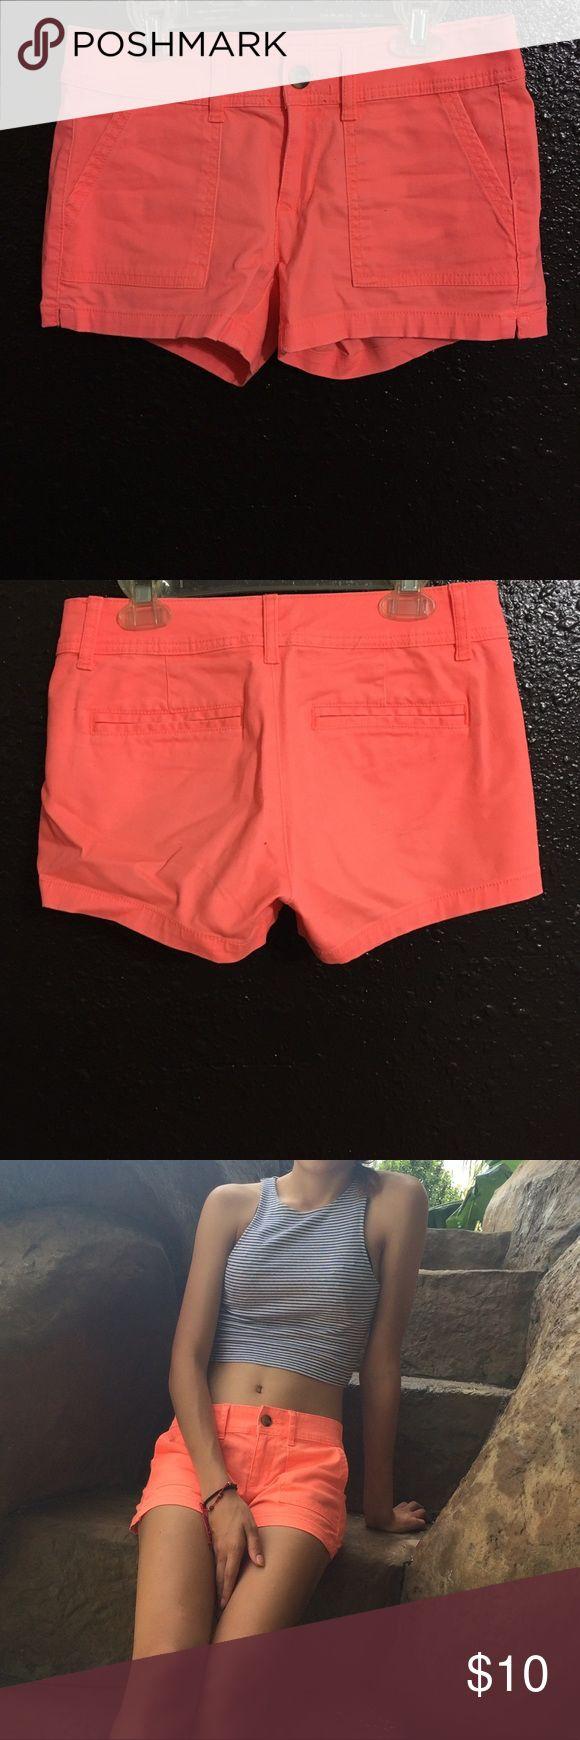 Arizona neon shorts Cute Arizona shorts are really comfy and eye popping. Used it once then I gained weight🤷♀️ Arizona Jean Company Shorts